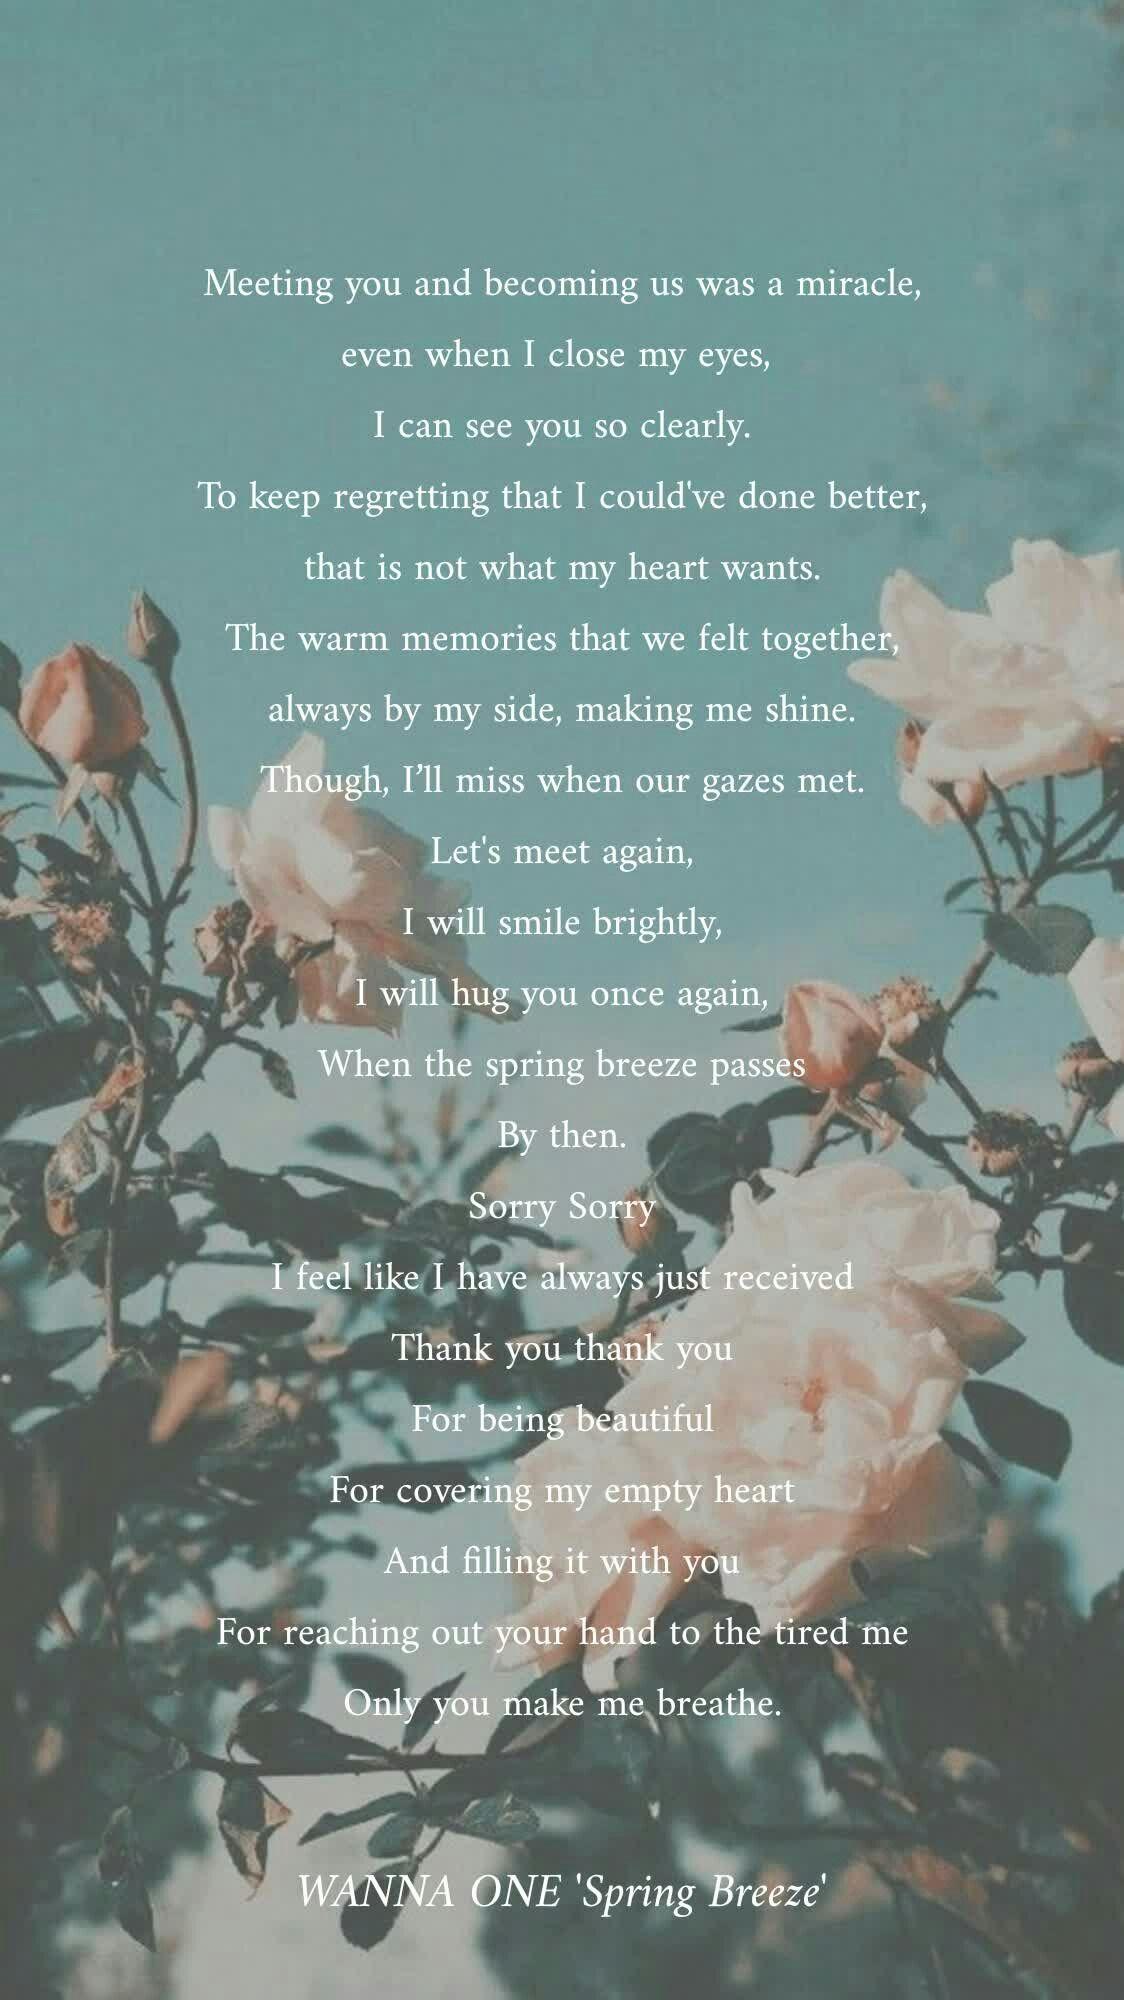 Spring Breeze Wannaone Powerofdestiny Kpop Lyrics Quotes In 2019